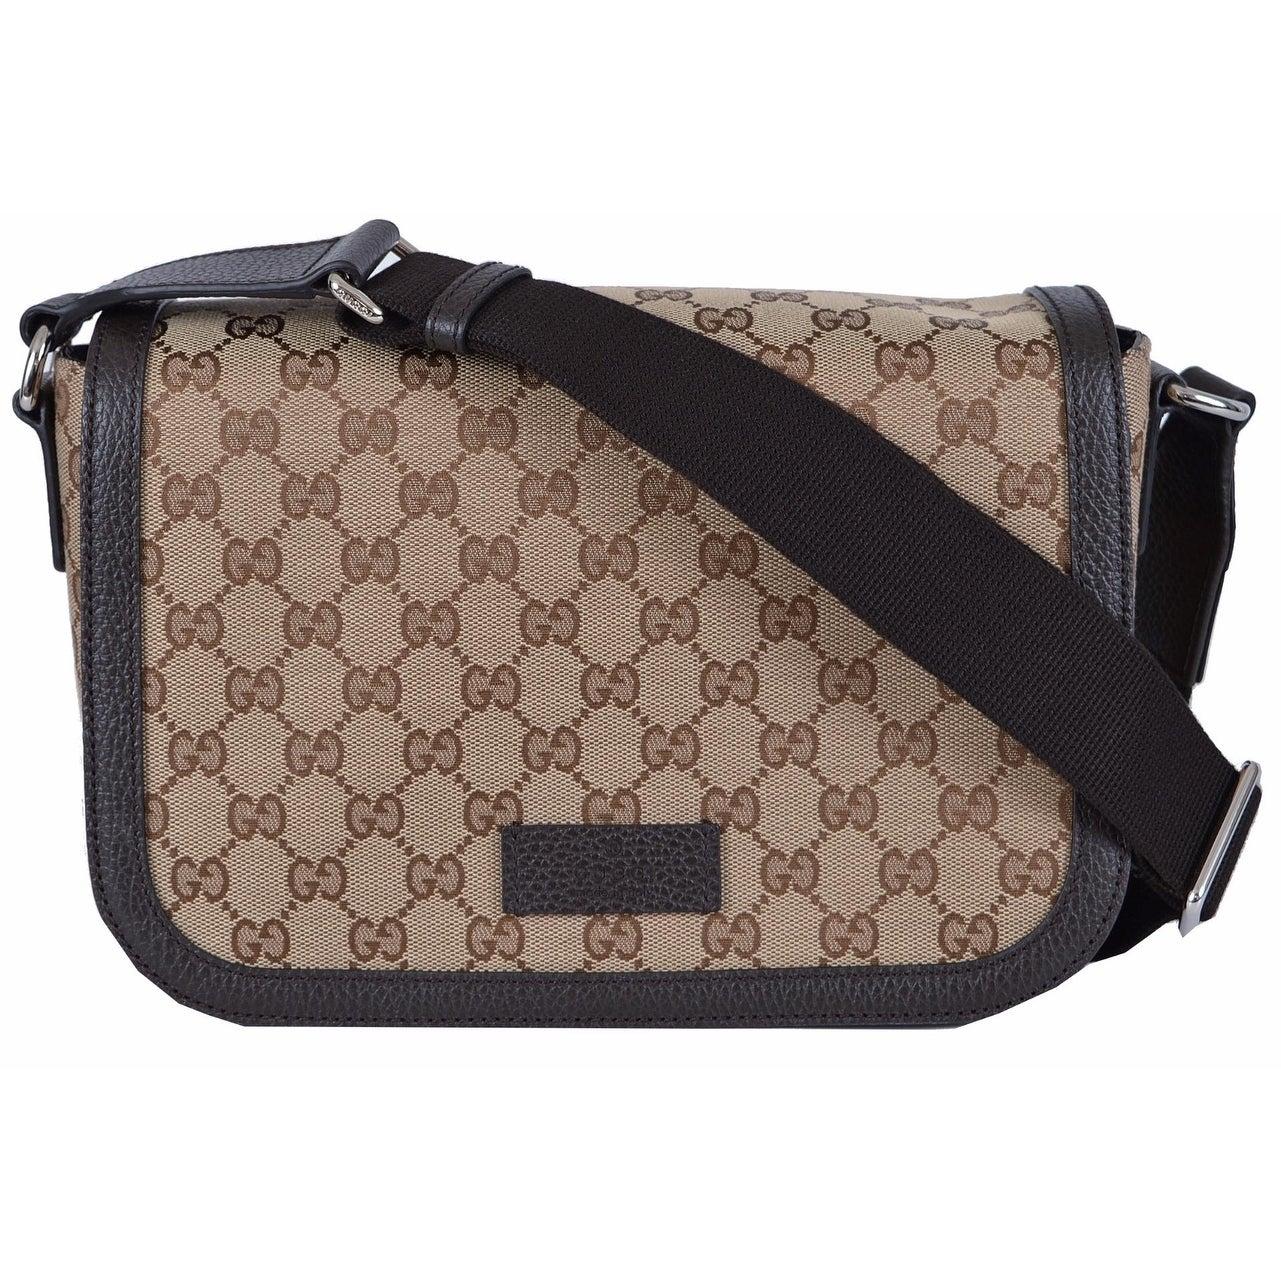 11f6aeac48a Shop Gucci 449172 GG Guccissima Canvas Medium Crossbody Messenger Bag Purse  - Brown - Free Shipping Today - Overstock - 13218759